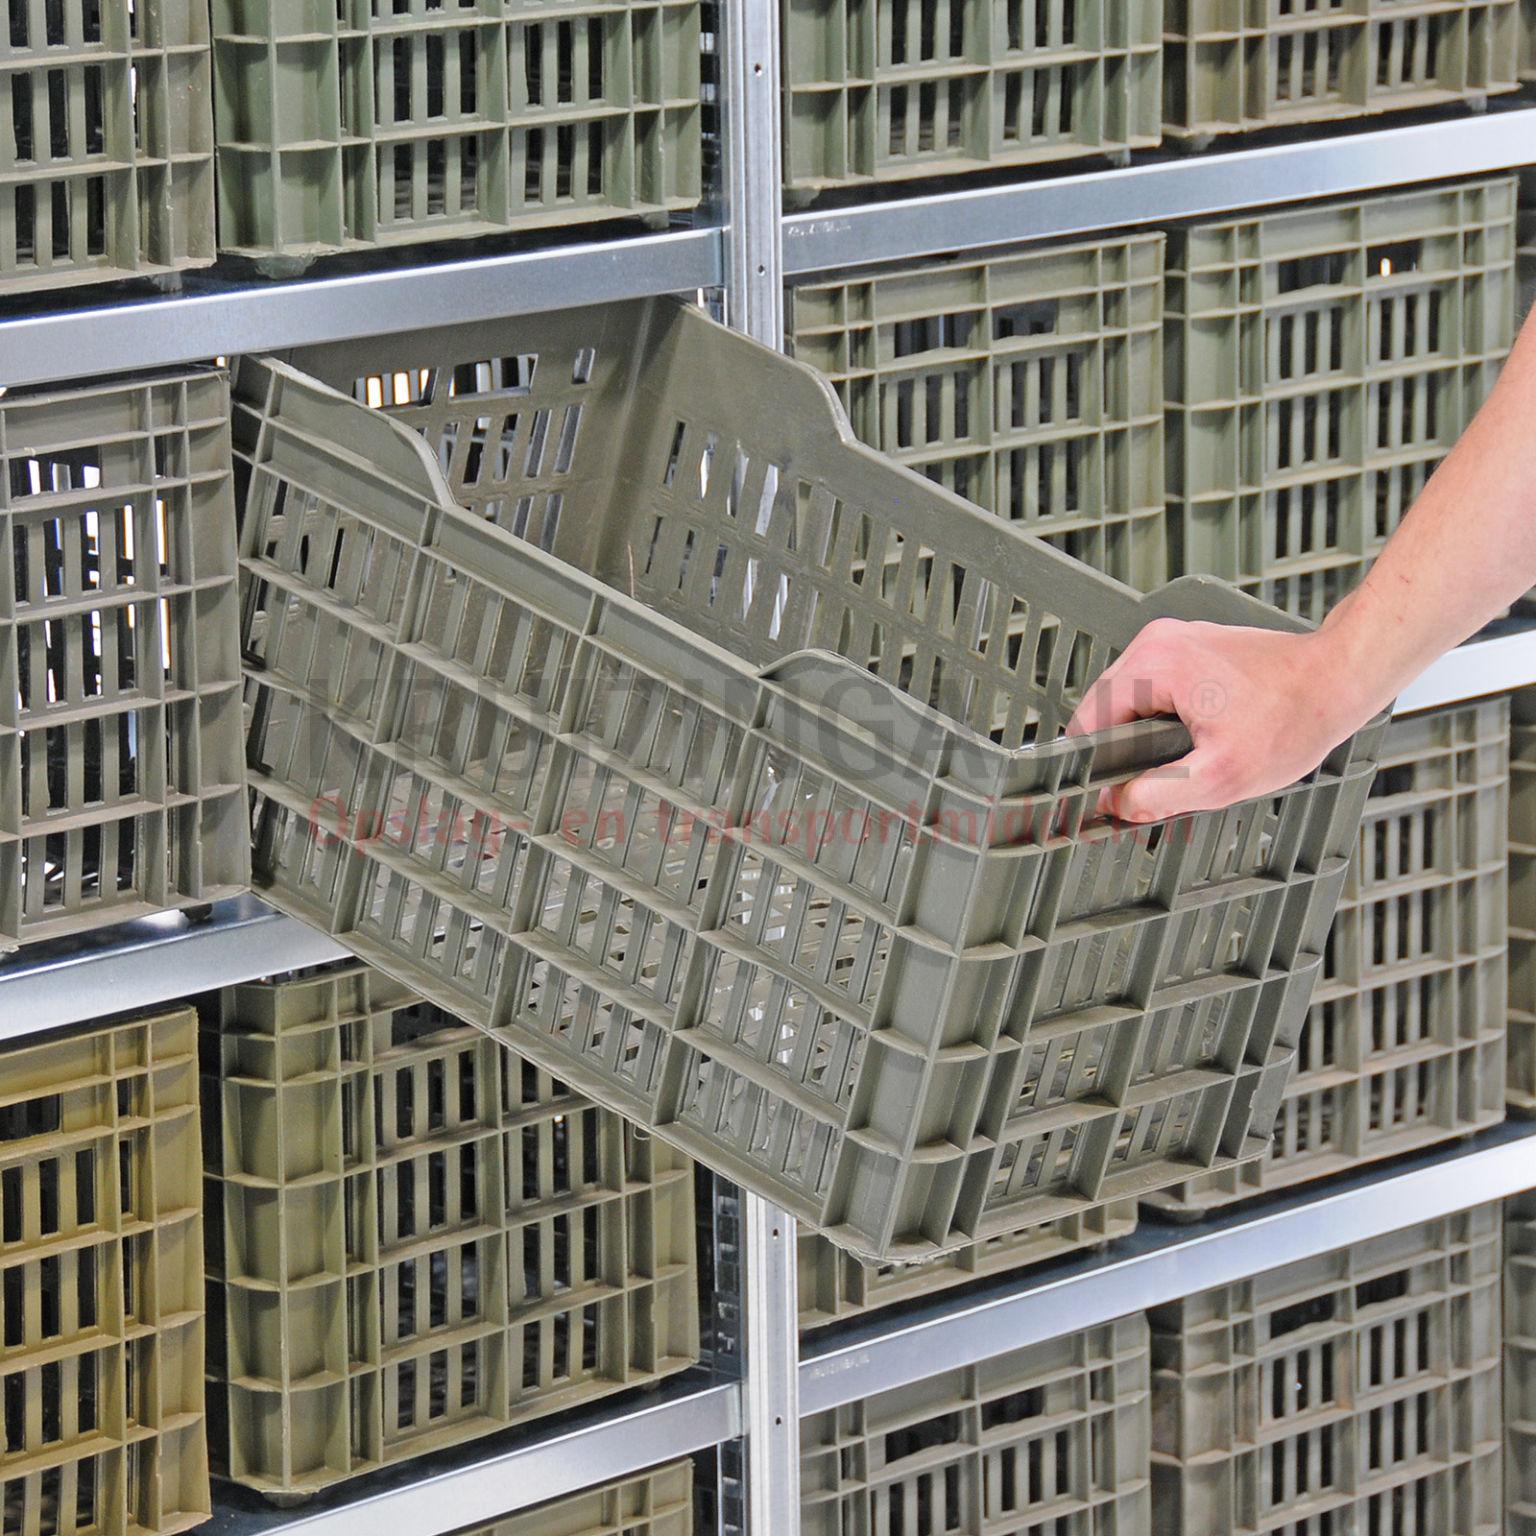 kombination satz regale kombination satz fachbodenregal inkl 63 stapelboxen gebraucht ab 544. Black Bedroom Furniture Sets. Home Design Ideas